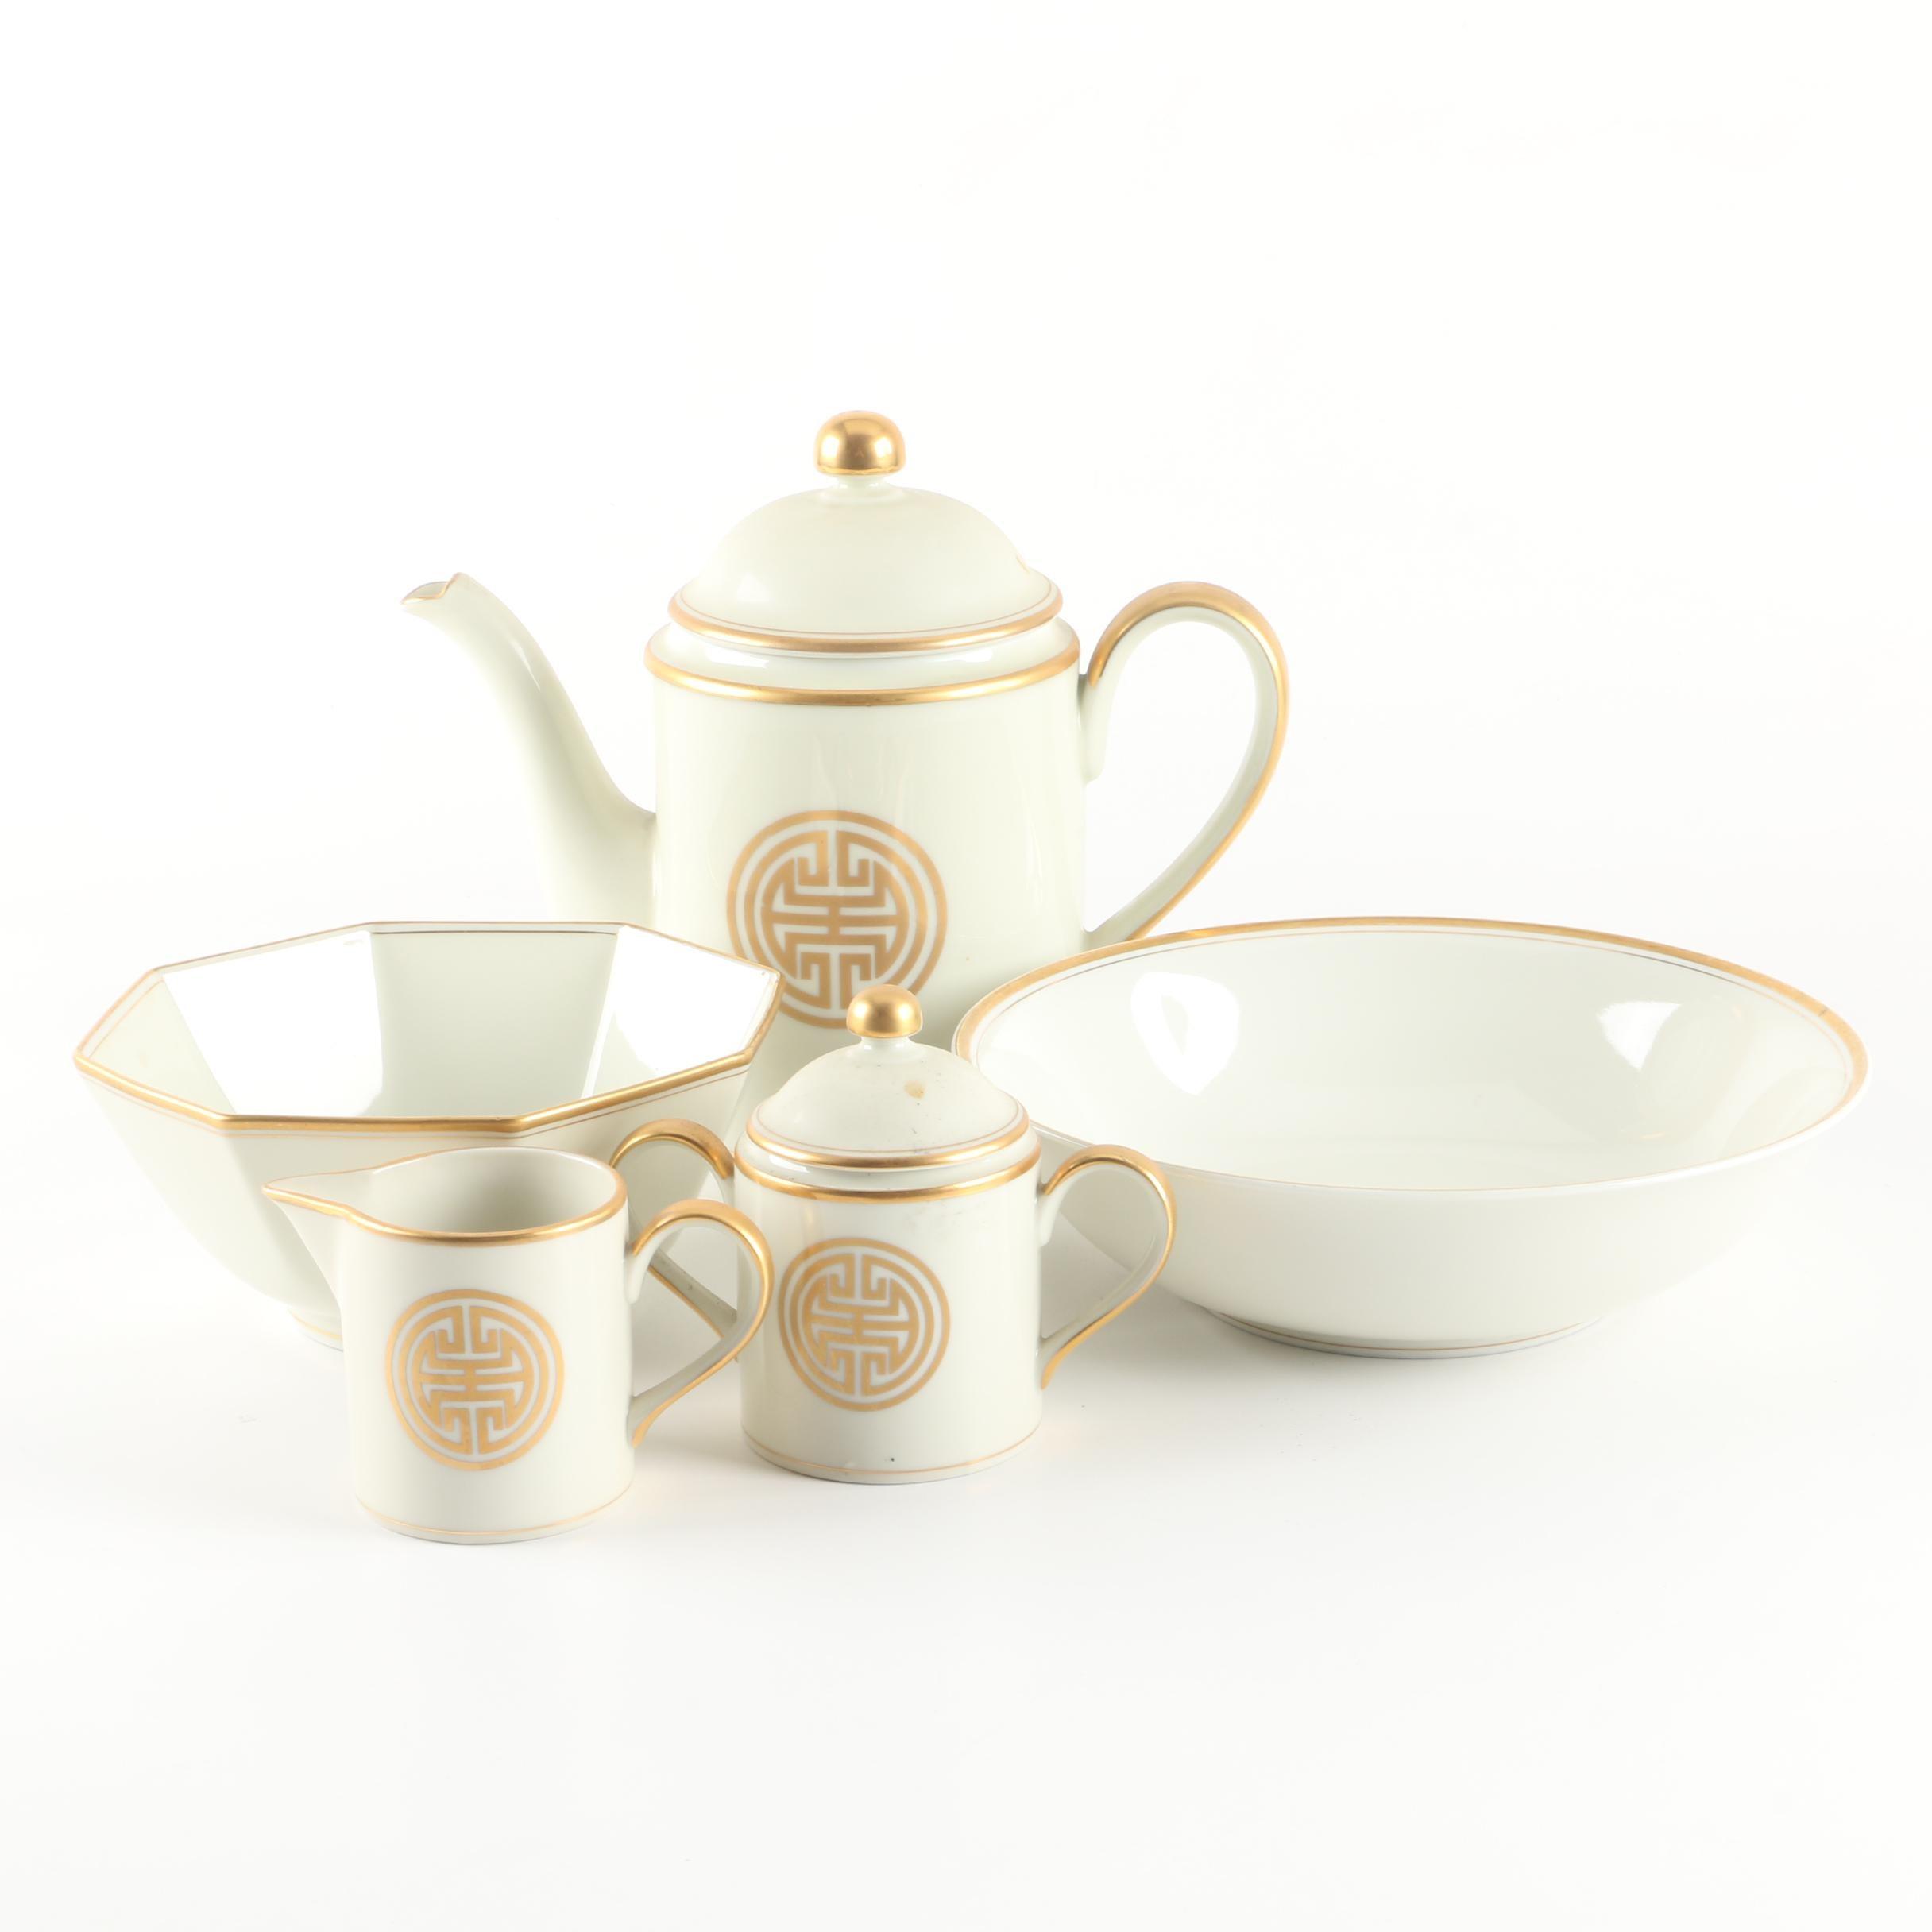 "Fitz and Floyd Porcelain ""Gold Mandarin Crest"" Serveware"